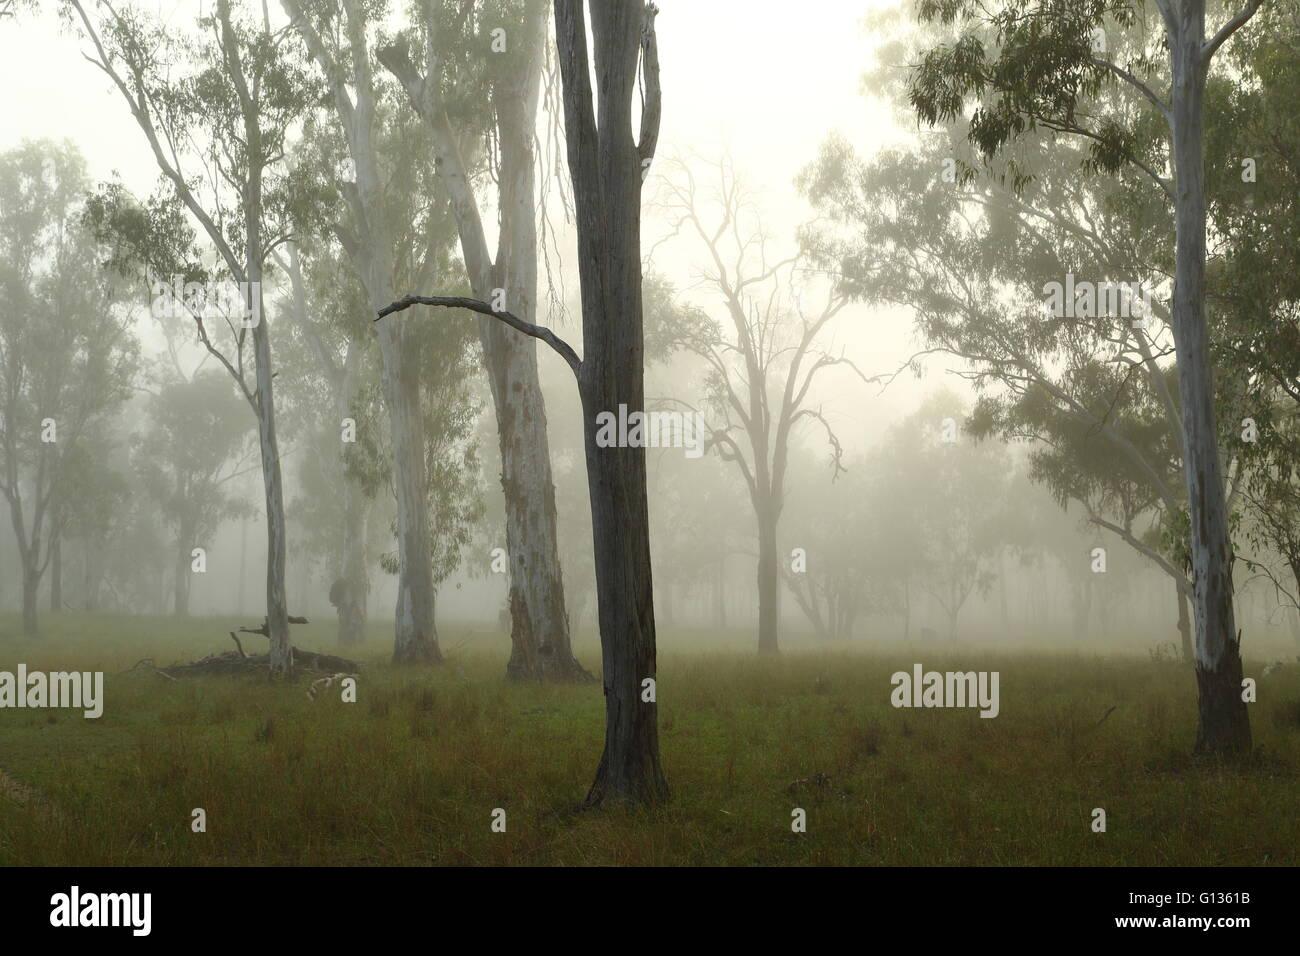 Morning fog enveloping eucalyptus trees on a farm near Eidsvold, Queensland, Australia. - Stock Image